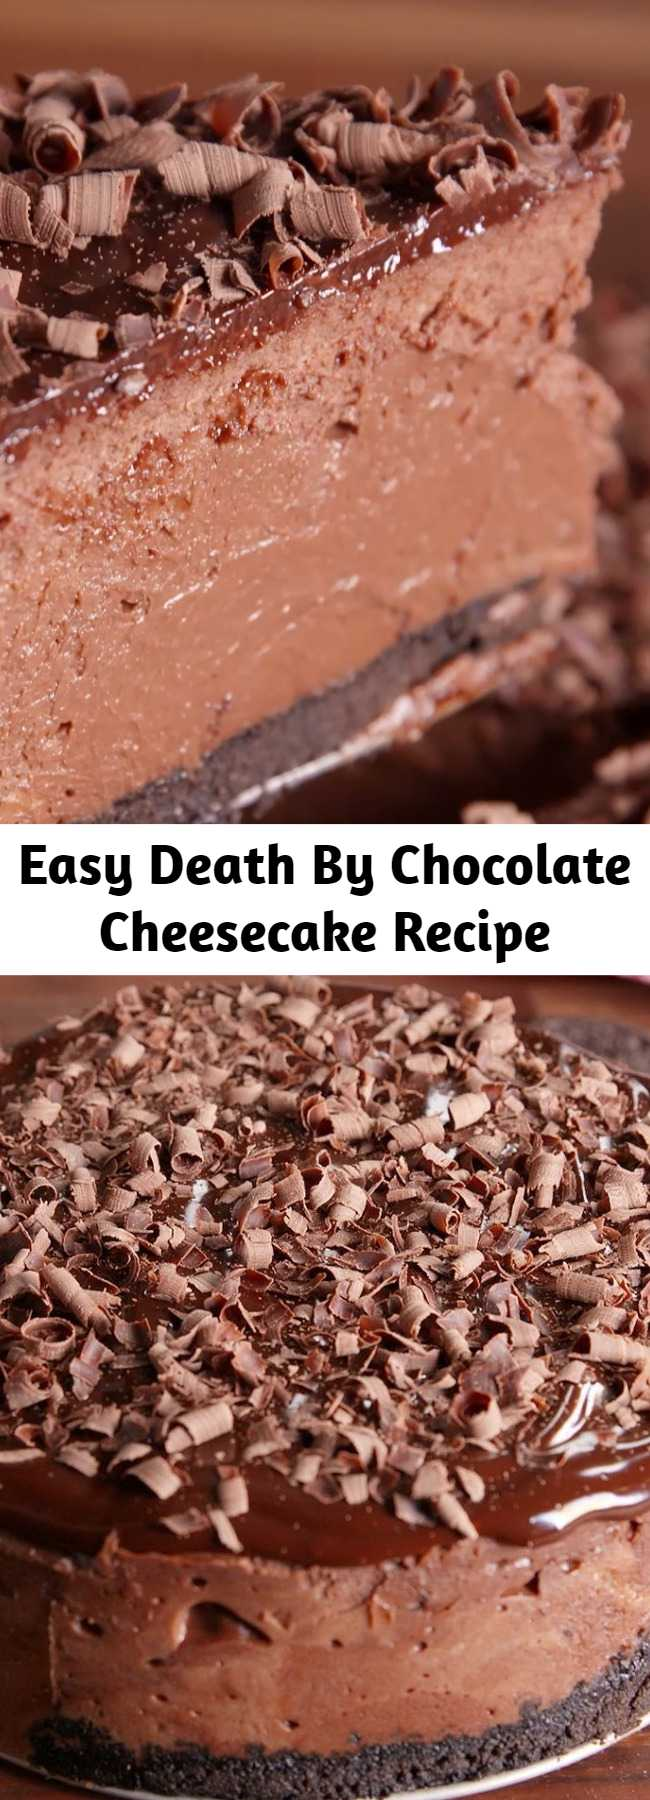 Easy Death By Chocolate Cheesecake Recipe - Easy Death By Chocolate Cheesecake Recipe - SO. MUCH. CHOCOLATE. #easy #recipe #deathbychocolate #cheesecake #chocolatecheesecake #chocolate #dessert #sweet #creamcheese #bake #oven #ganache